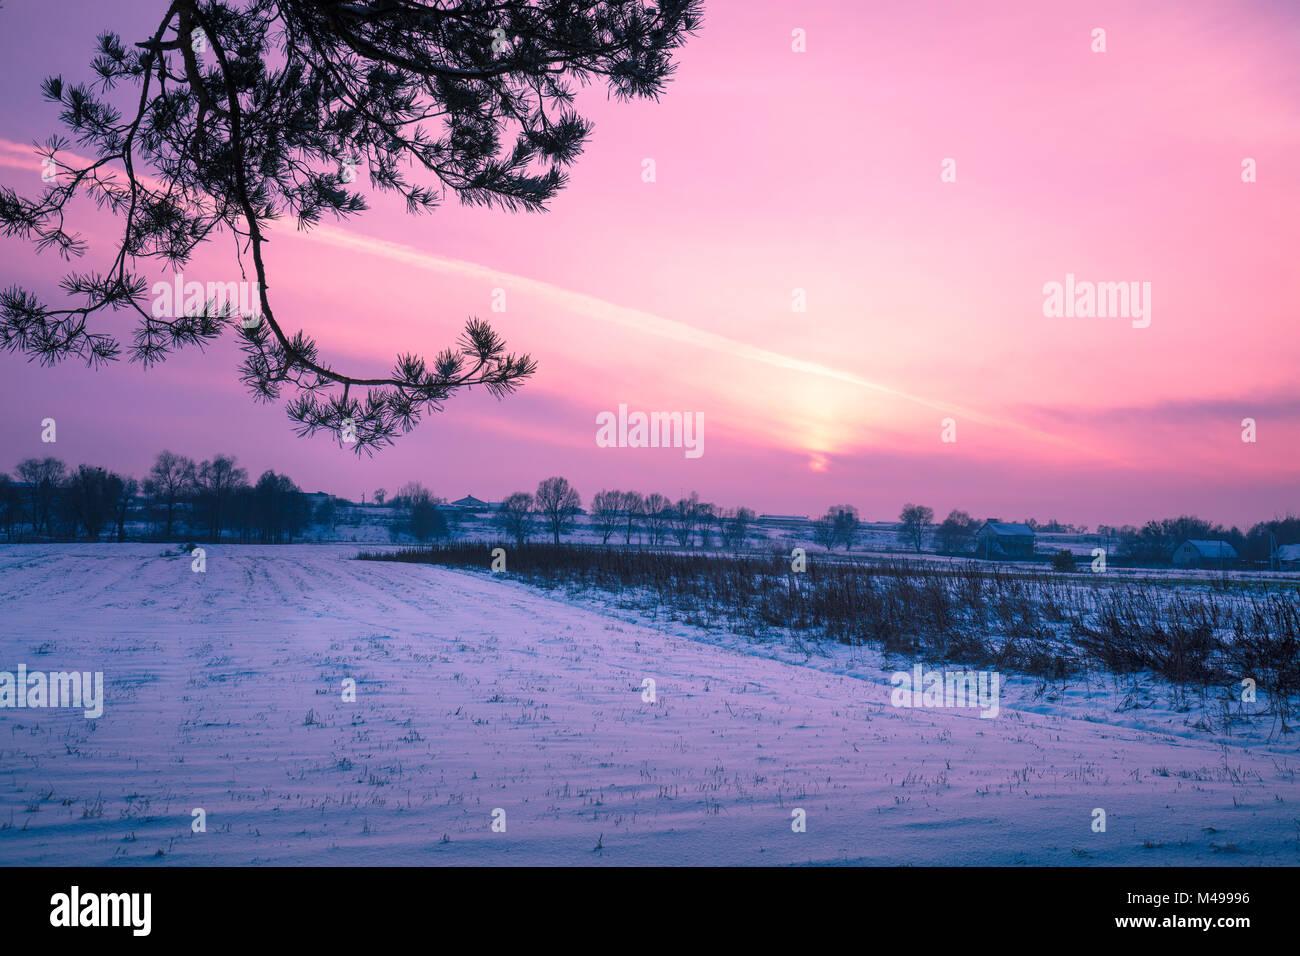 Snowy winter field at sunset light - Stock Image